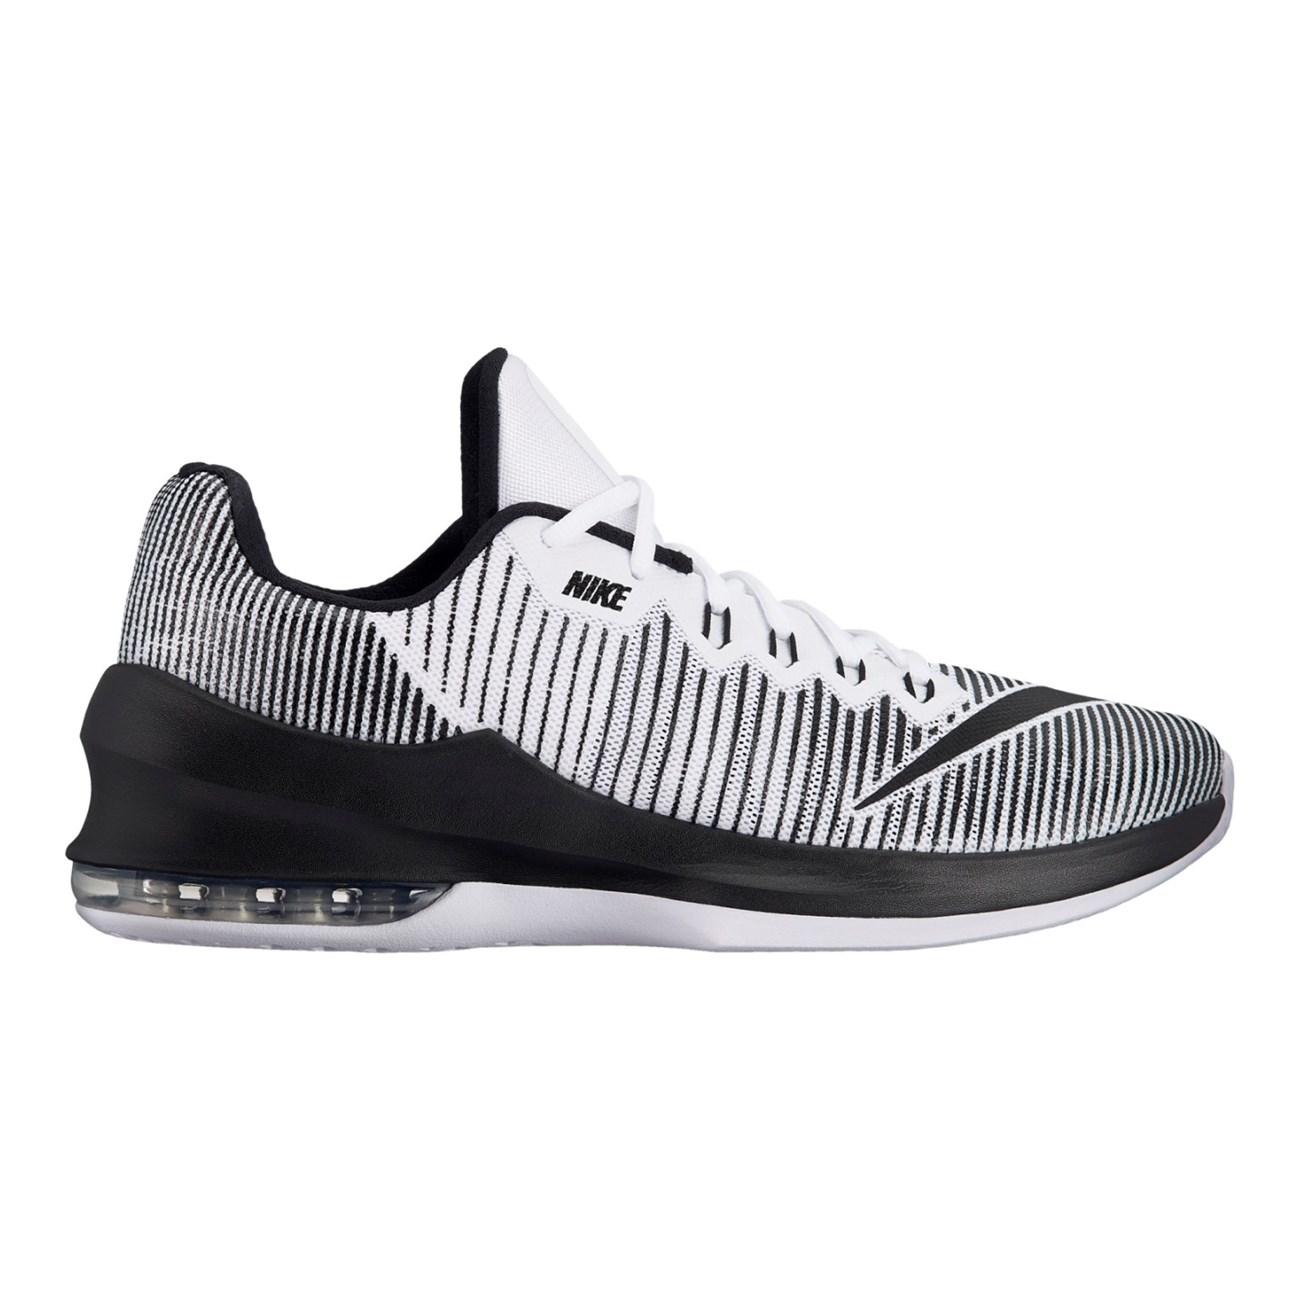 e6852f2df98 NIKE AIR MAX INFURIATE 2 LOW < Αθλητικά παπούτσια, ρούχα & αξεσουάρ ...